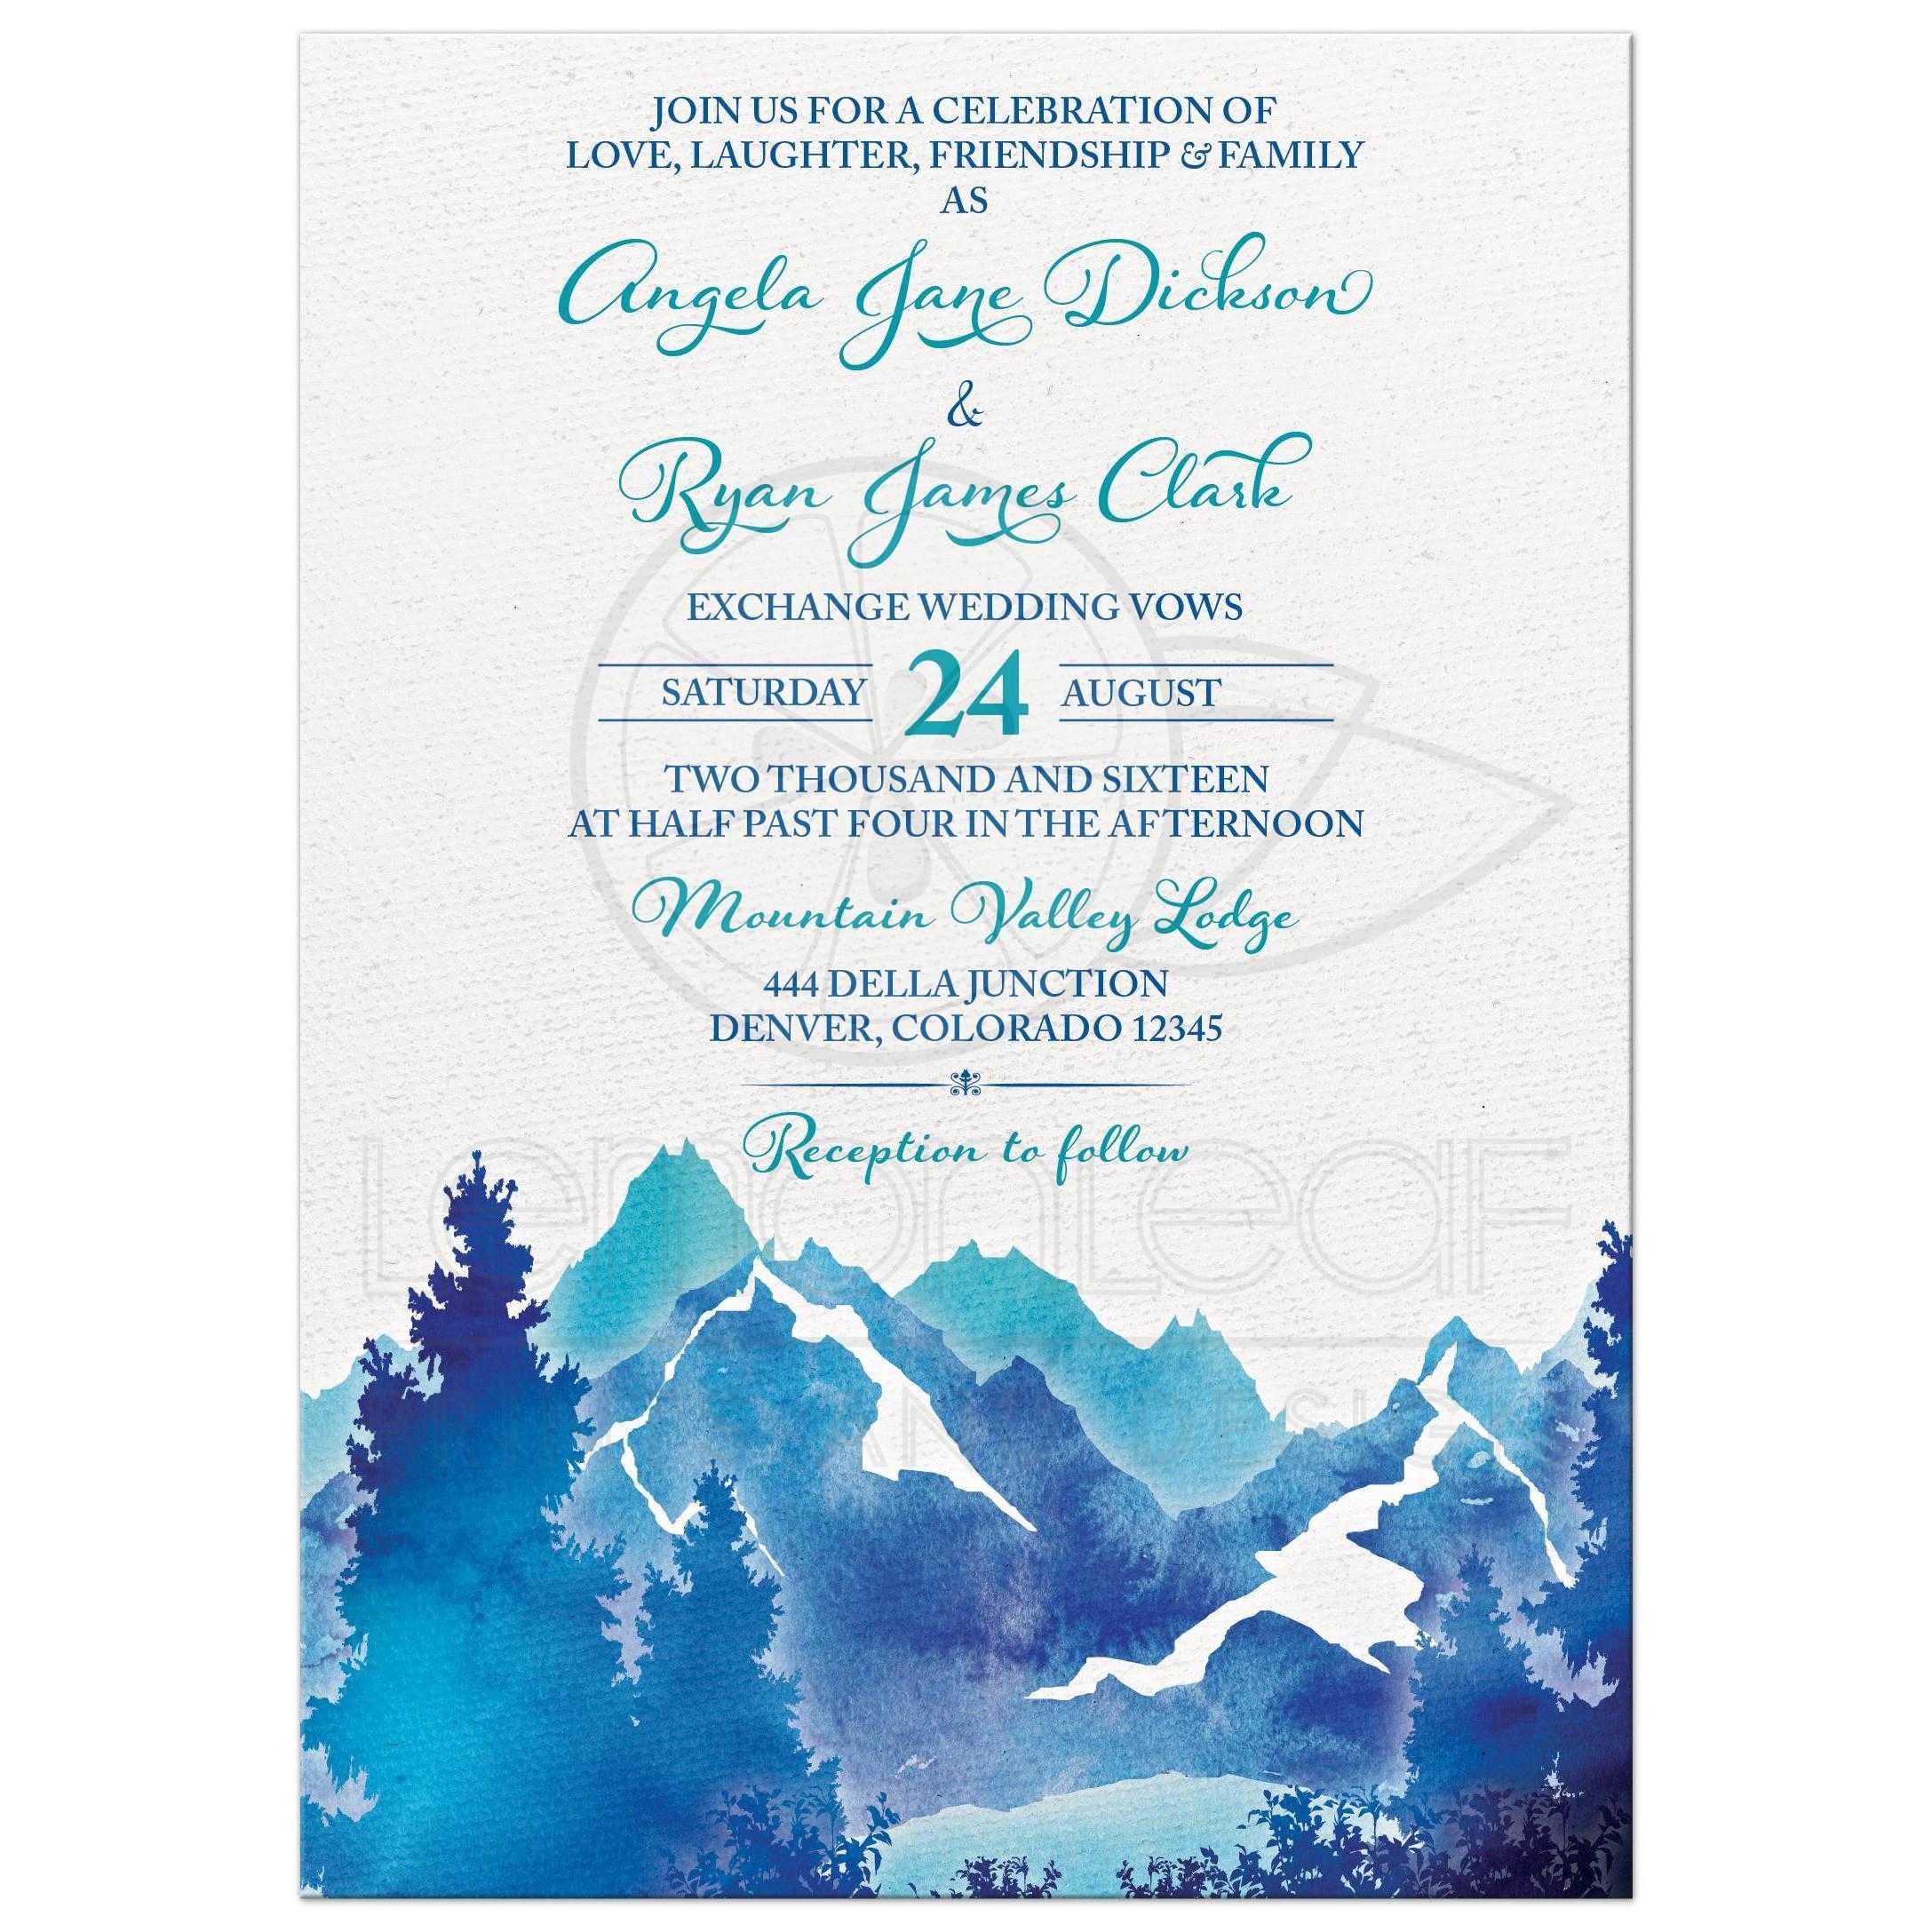 agenciademodeloscorupa: 4 Images Blue Wedding Invitation Cards